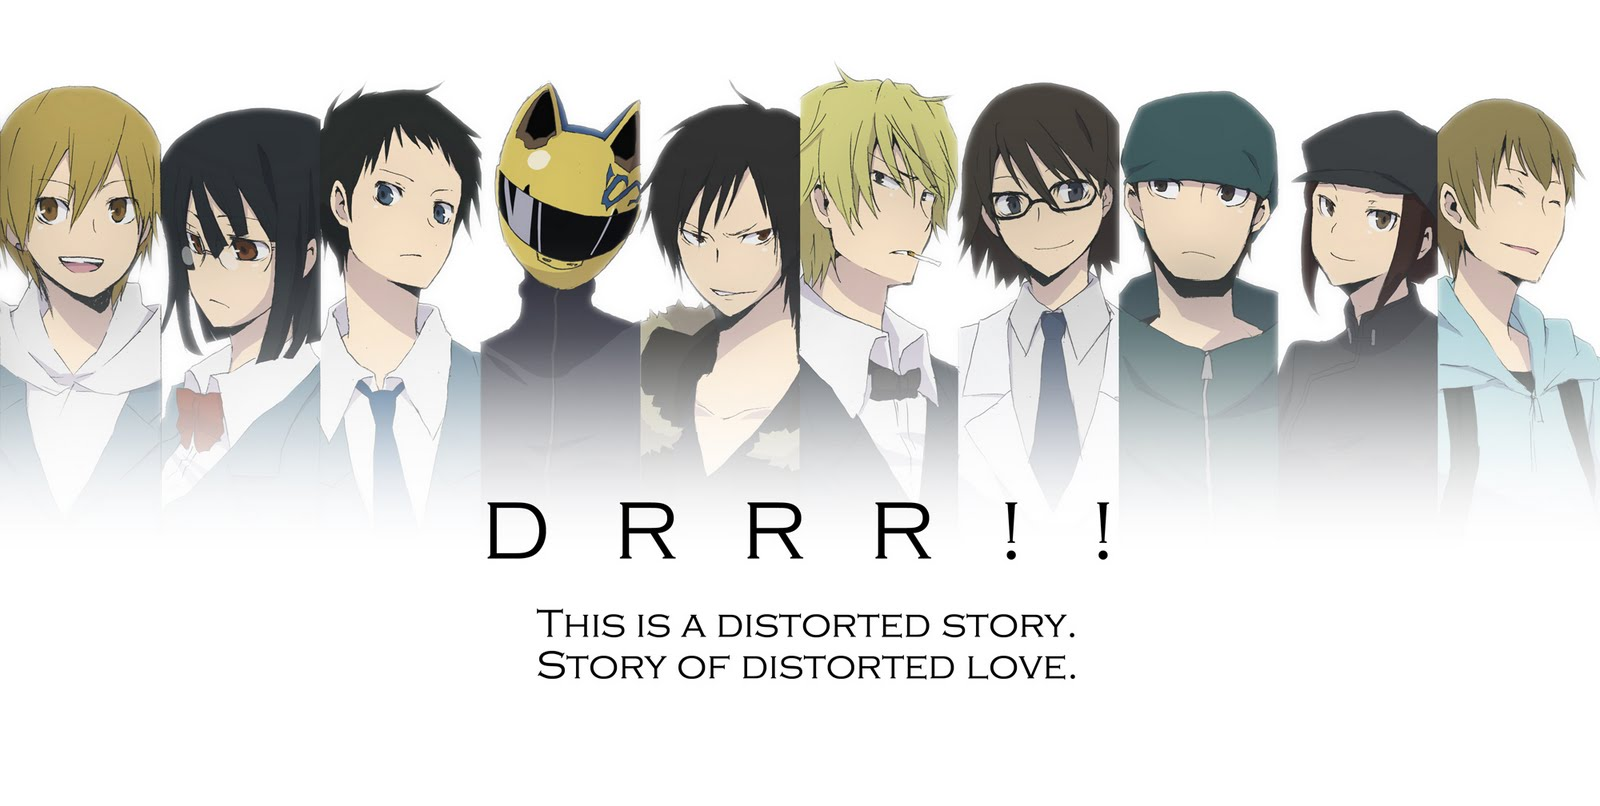 Durarara   Season 2 Anime Announced Durarara Characters